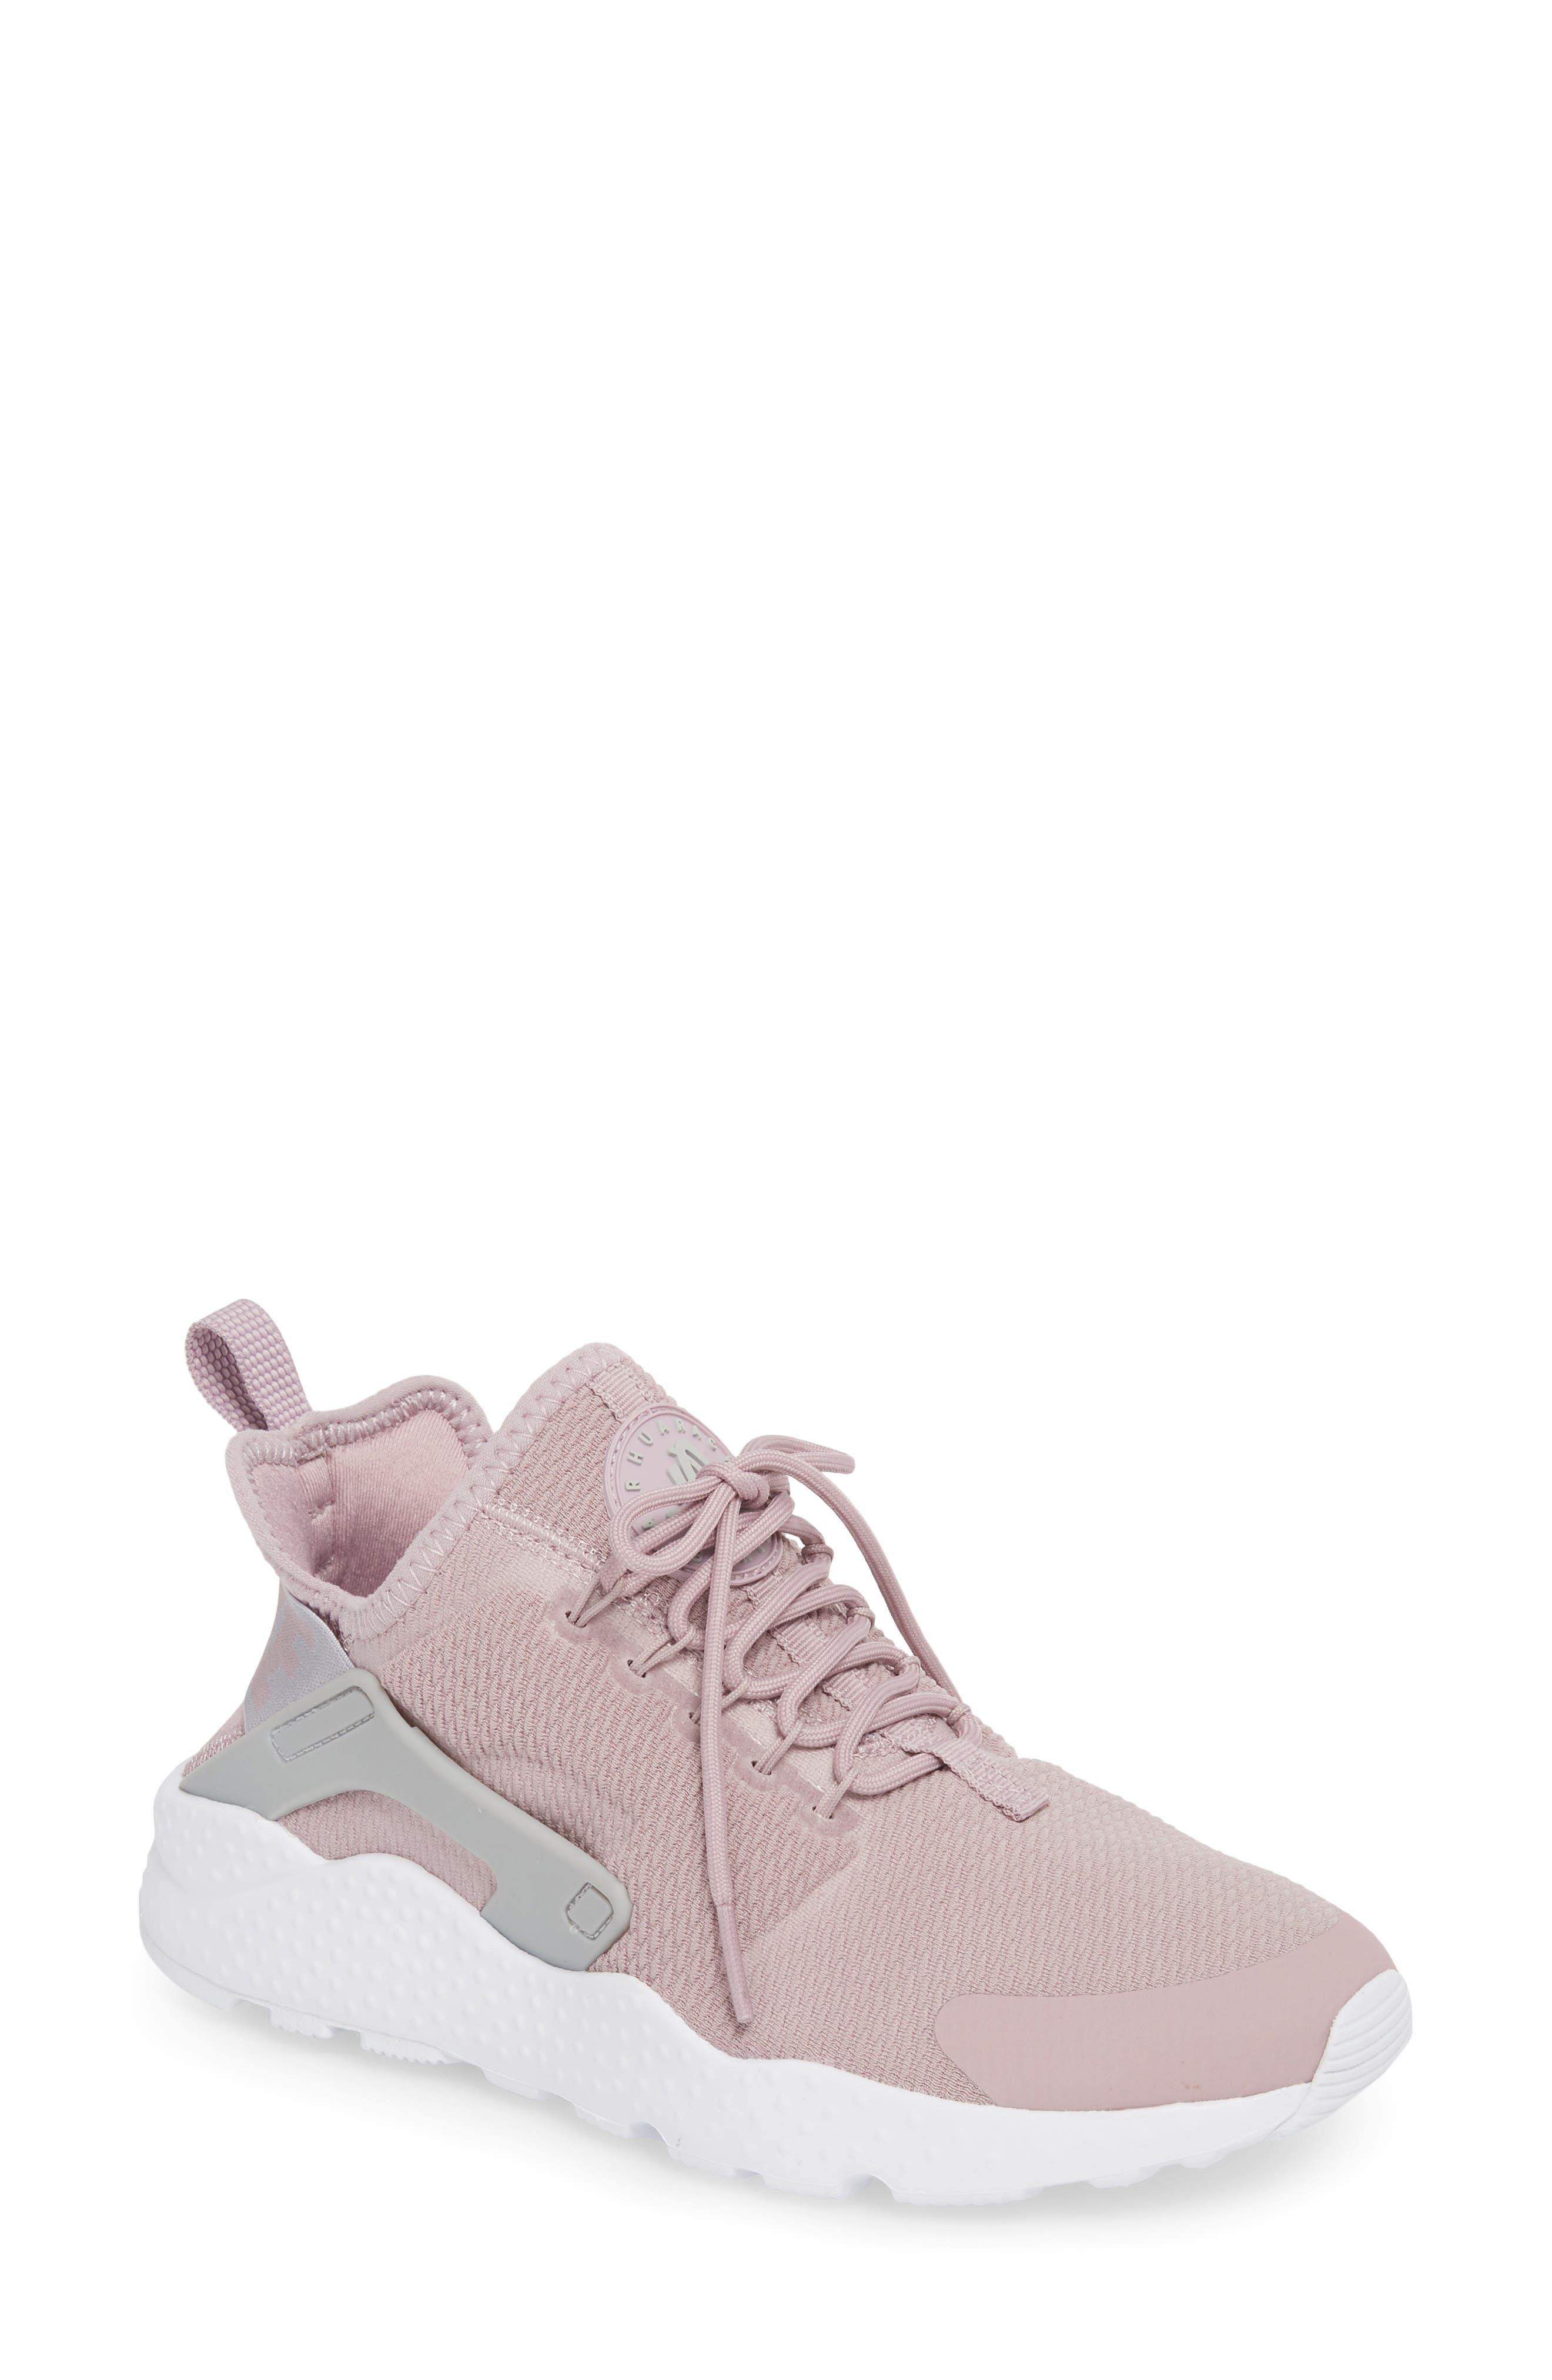 Air Huarache Sneaker,                         Main,                         color, Elemental Rose/ Wolf Grey